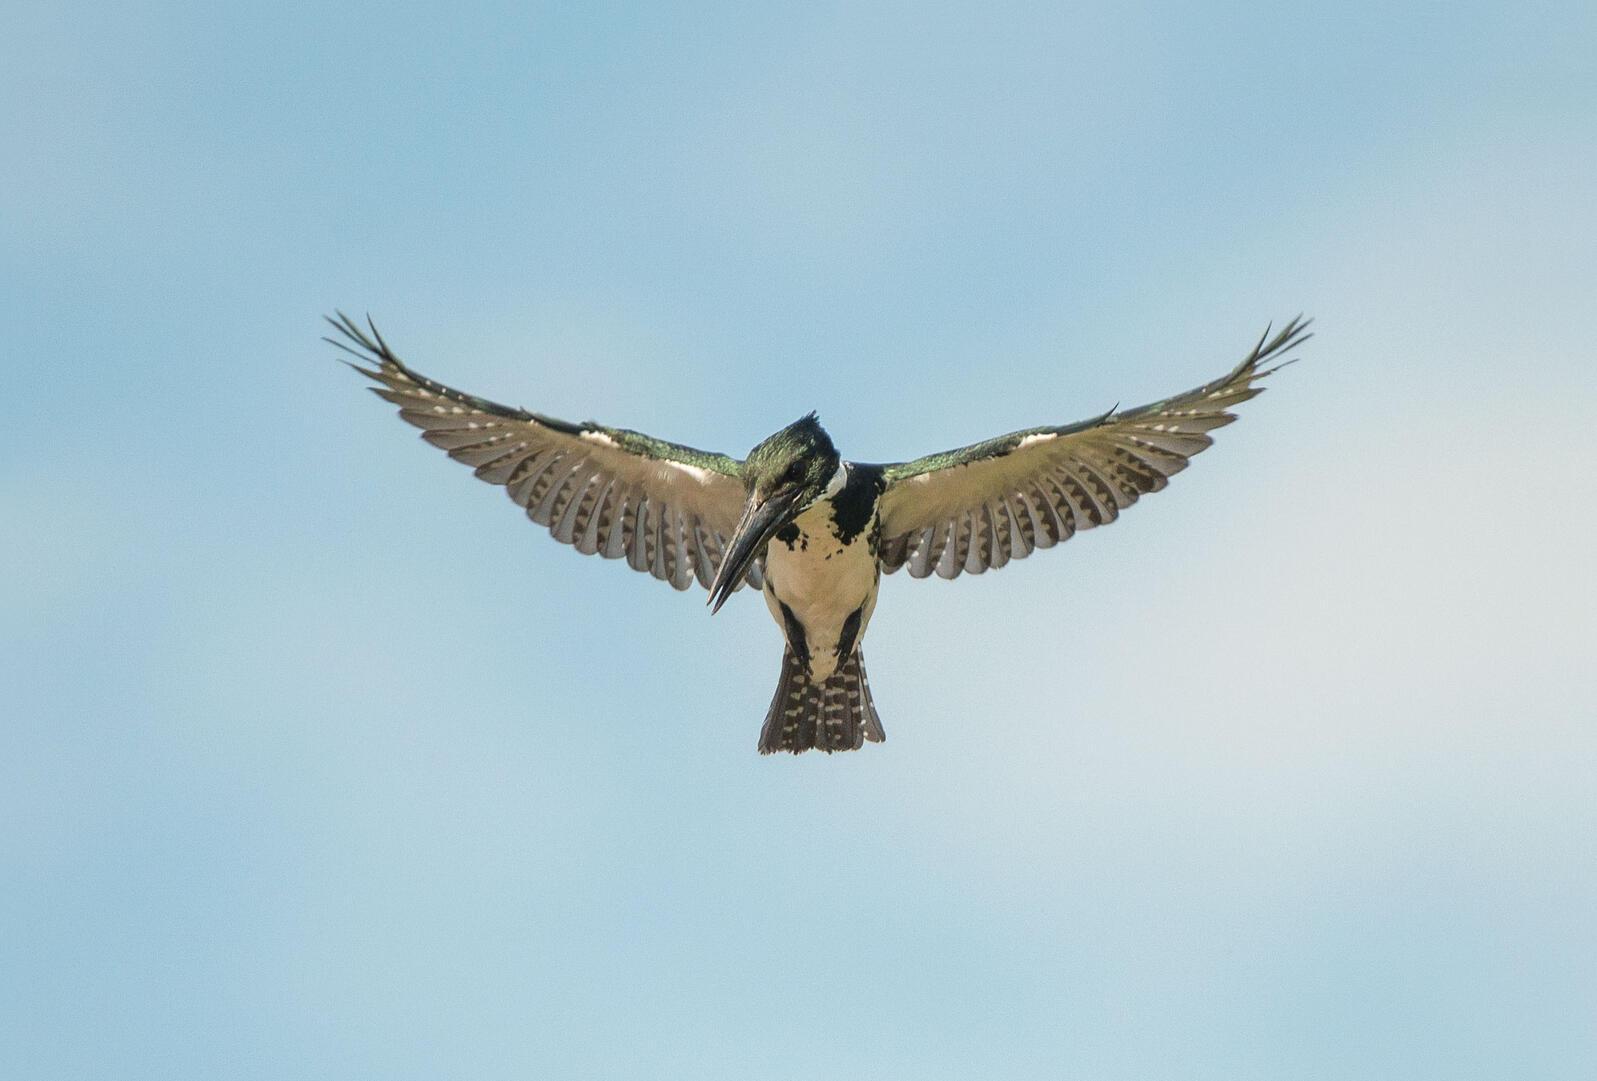 "Amazon Kingfisher. <a href=""https://commons.wikimedia.org/wiki/File:Female_amazon_kingfisher,_Tarcoles_river,_Costa_Rica,_December_2014.jpg"">Kpts44</a>/Wikimedia Commons (CC0 1.0)"